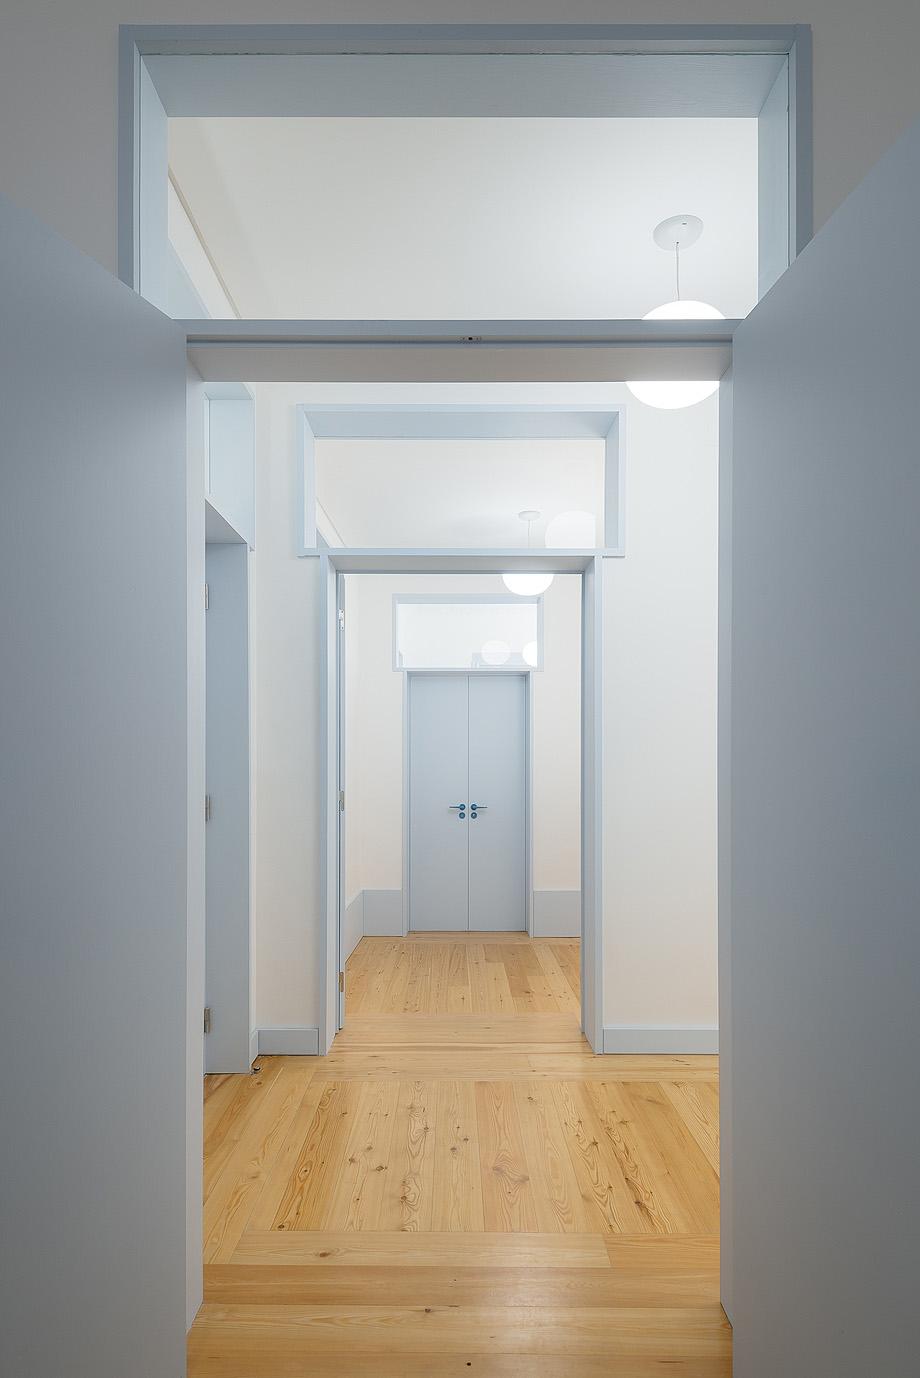 apartamentos pombalinos de aurora arquitectos - foto do mal o menos (13)